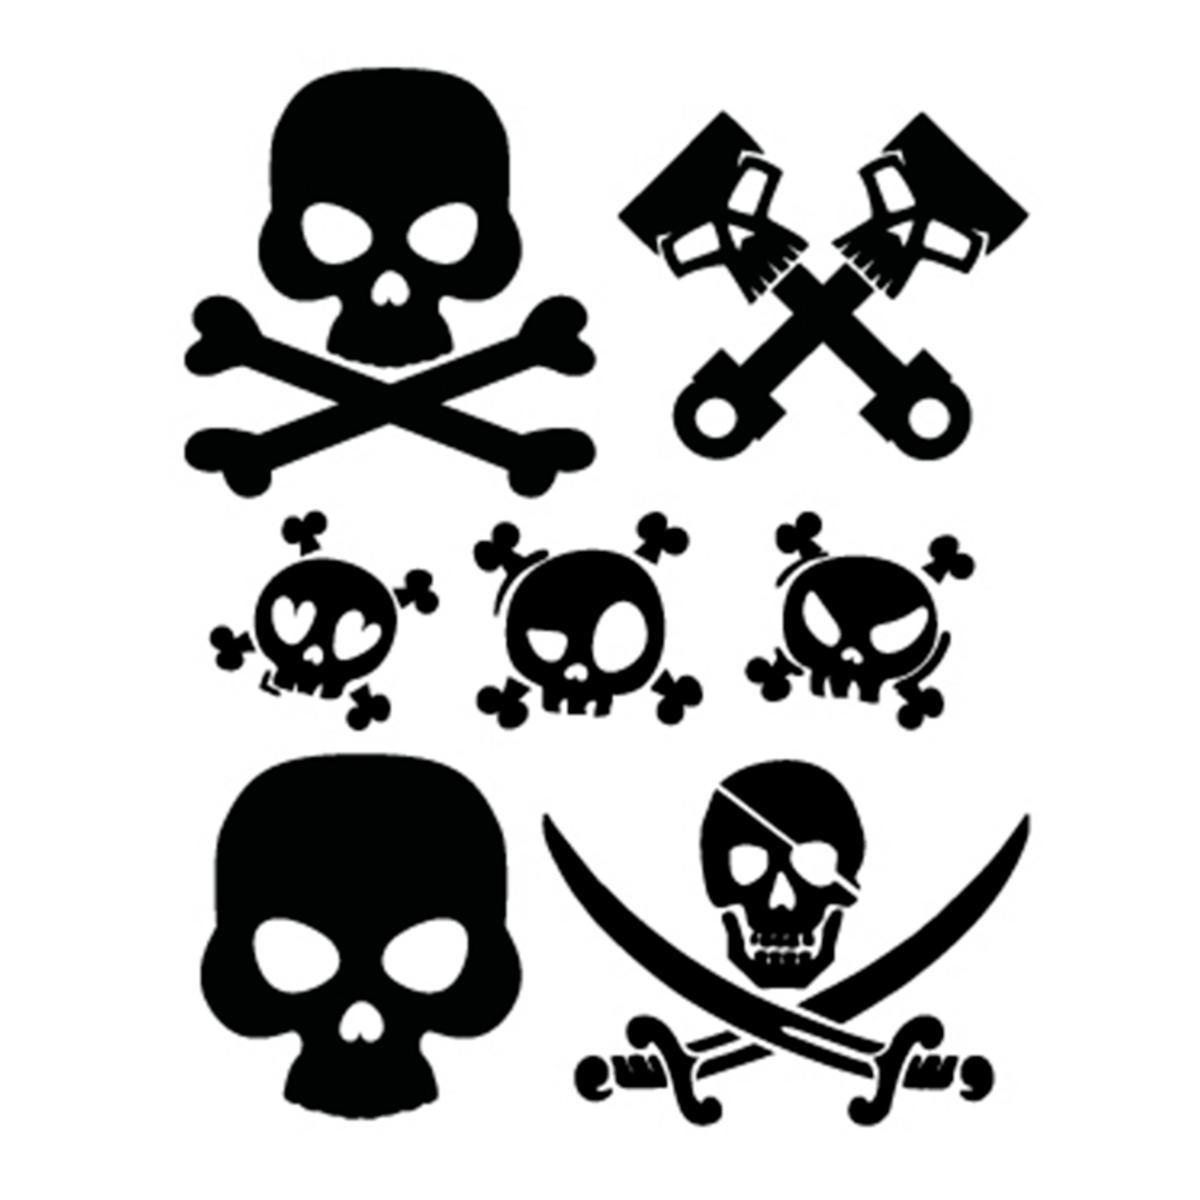 be2e75a4aed5 Sticker prespaced 7 skulls - ADHESIVE - Simoni Racing